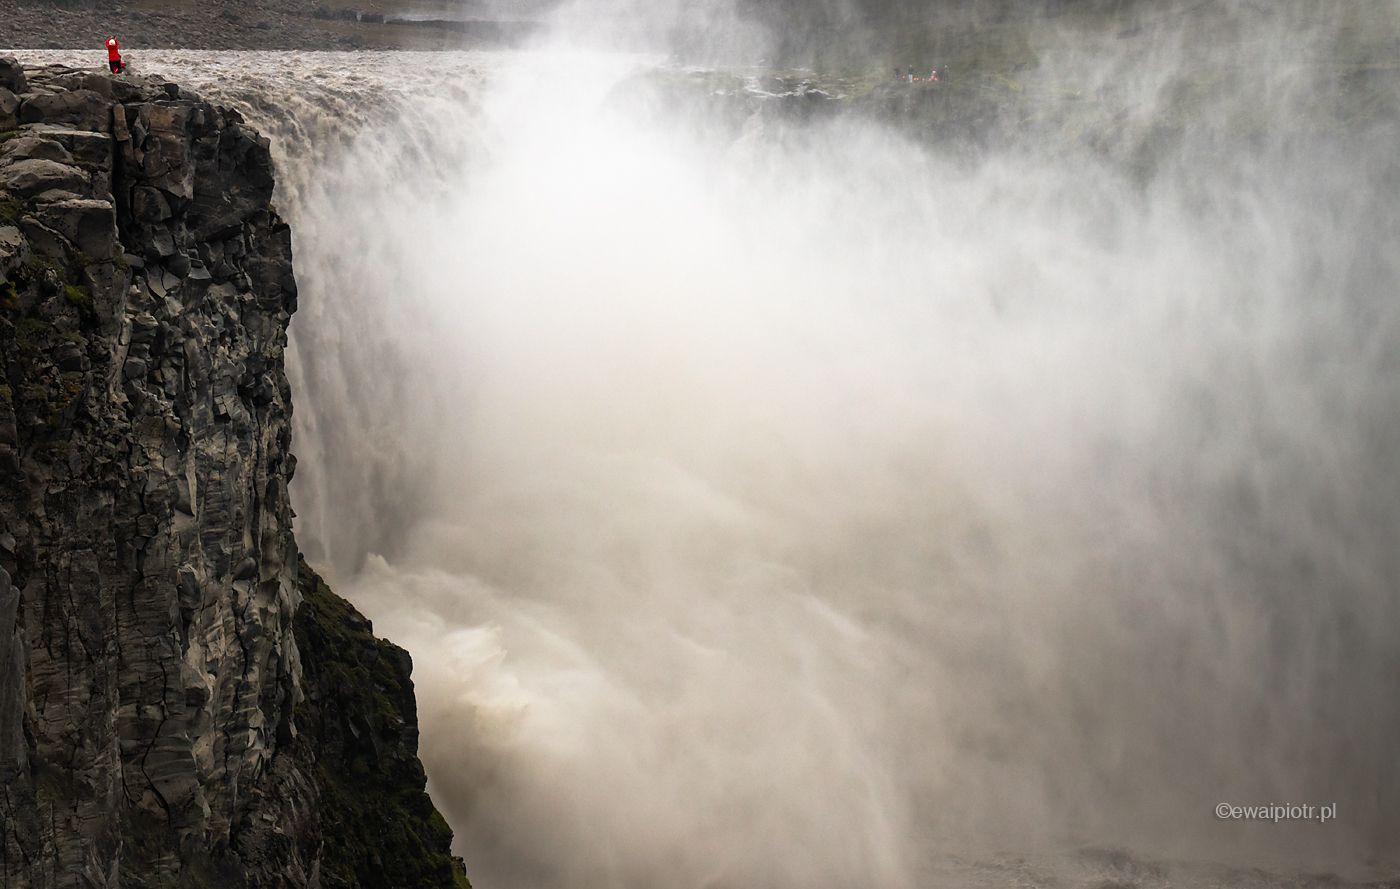 Potęga wodospadu Dettifoss, Islandia